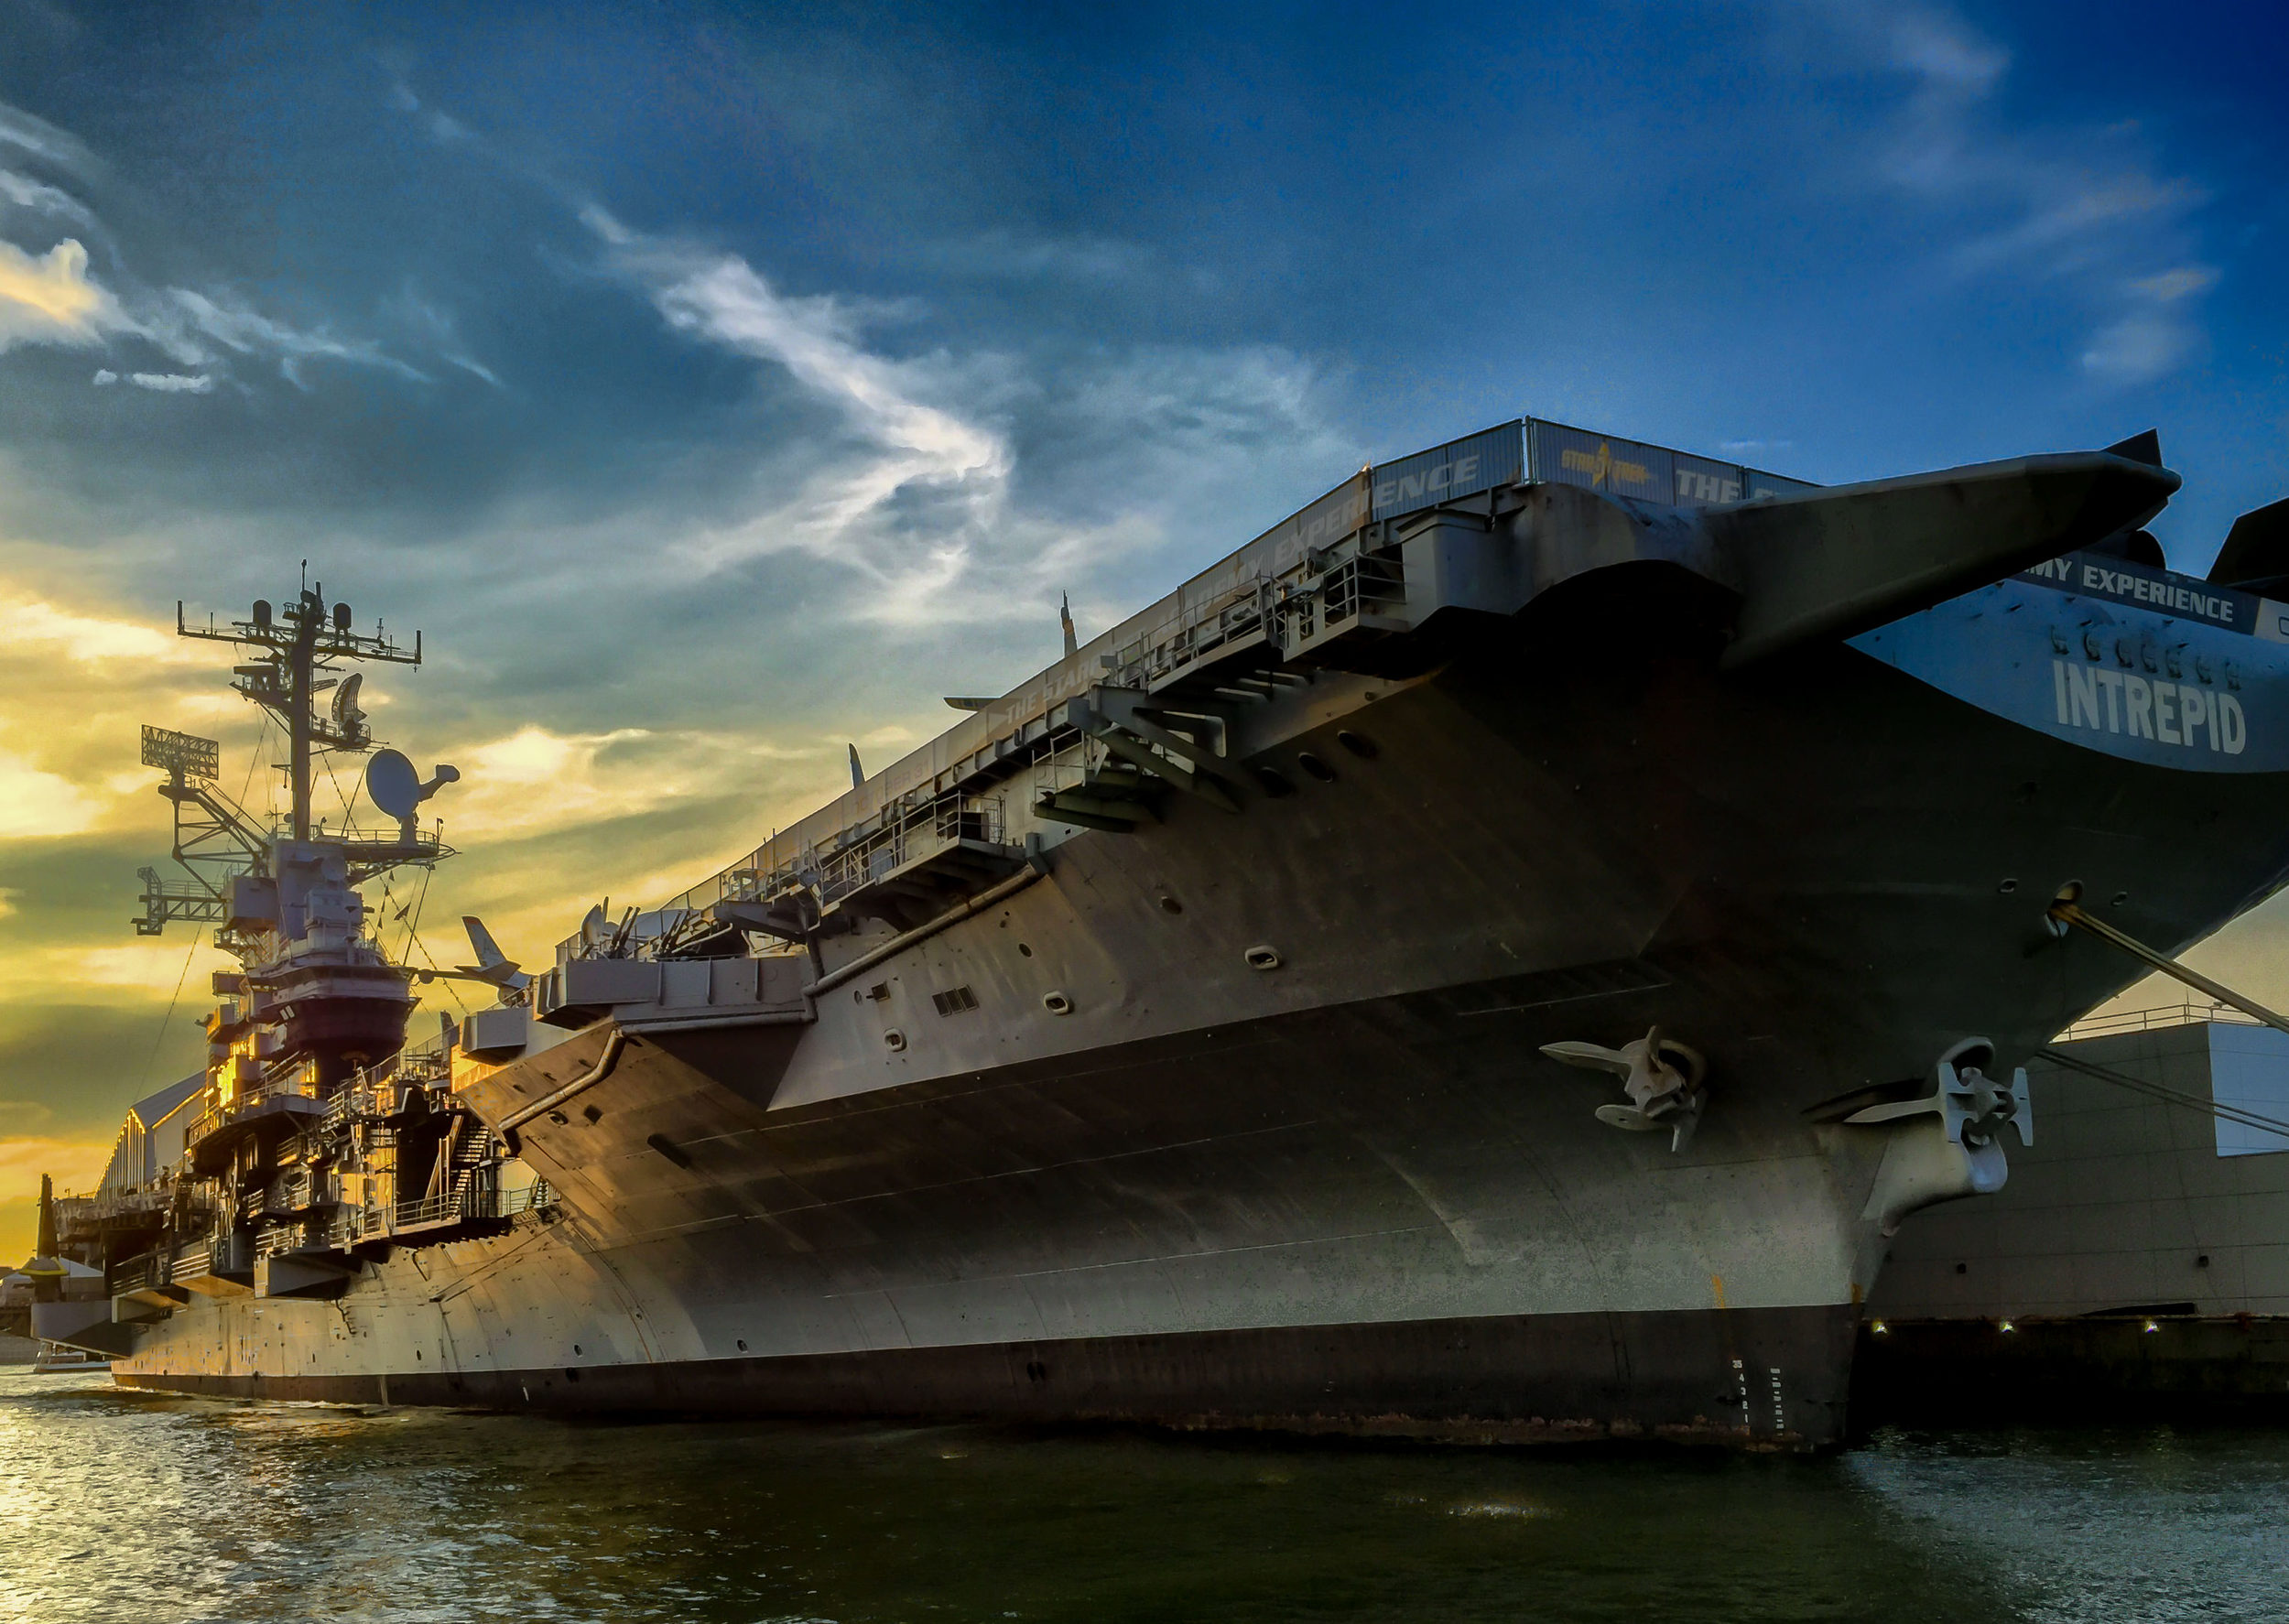 USS Intrepid at Sunset